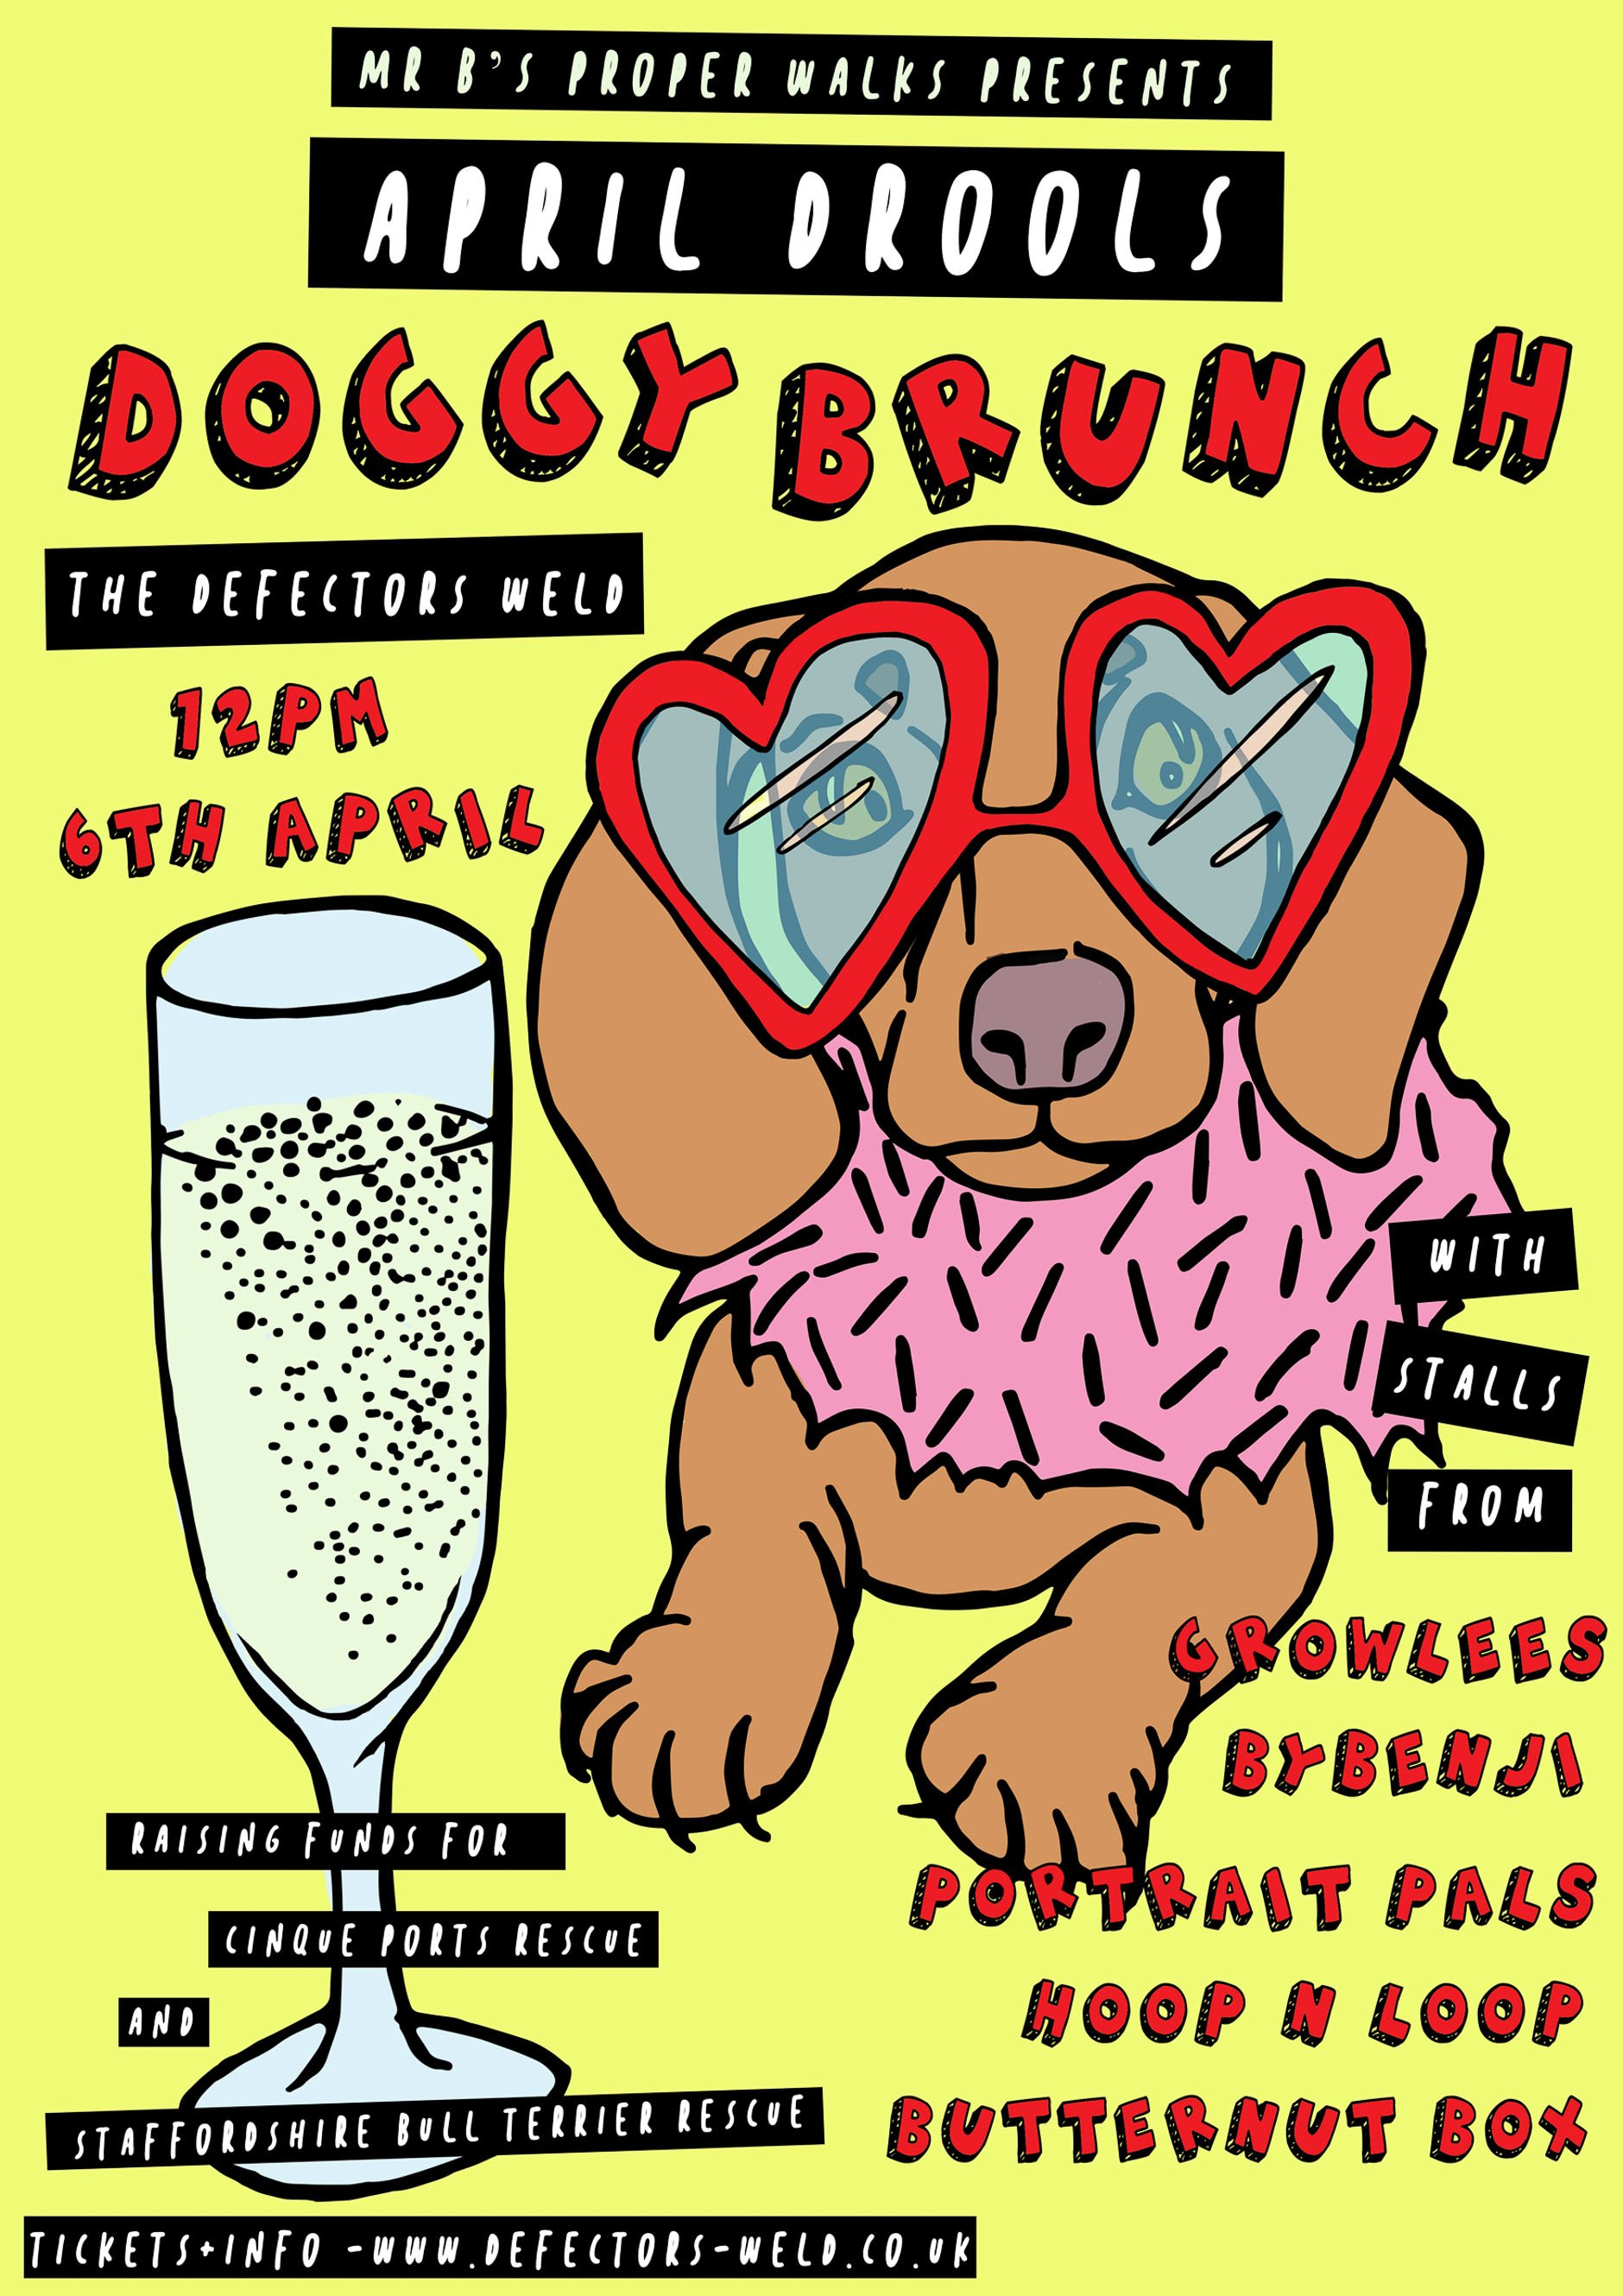 April Drools doggy brunch poster